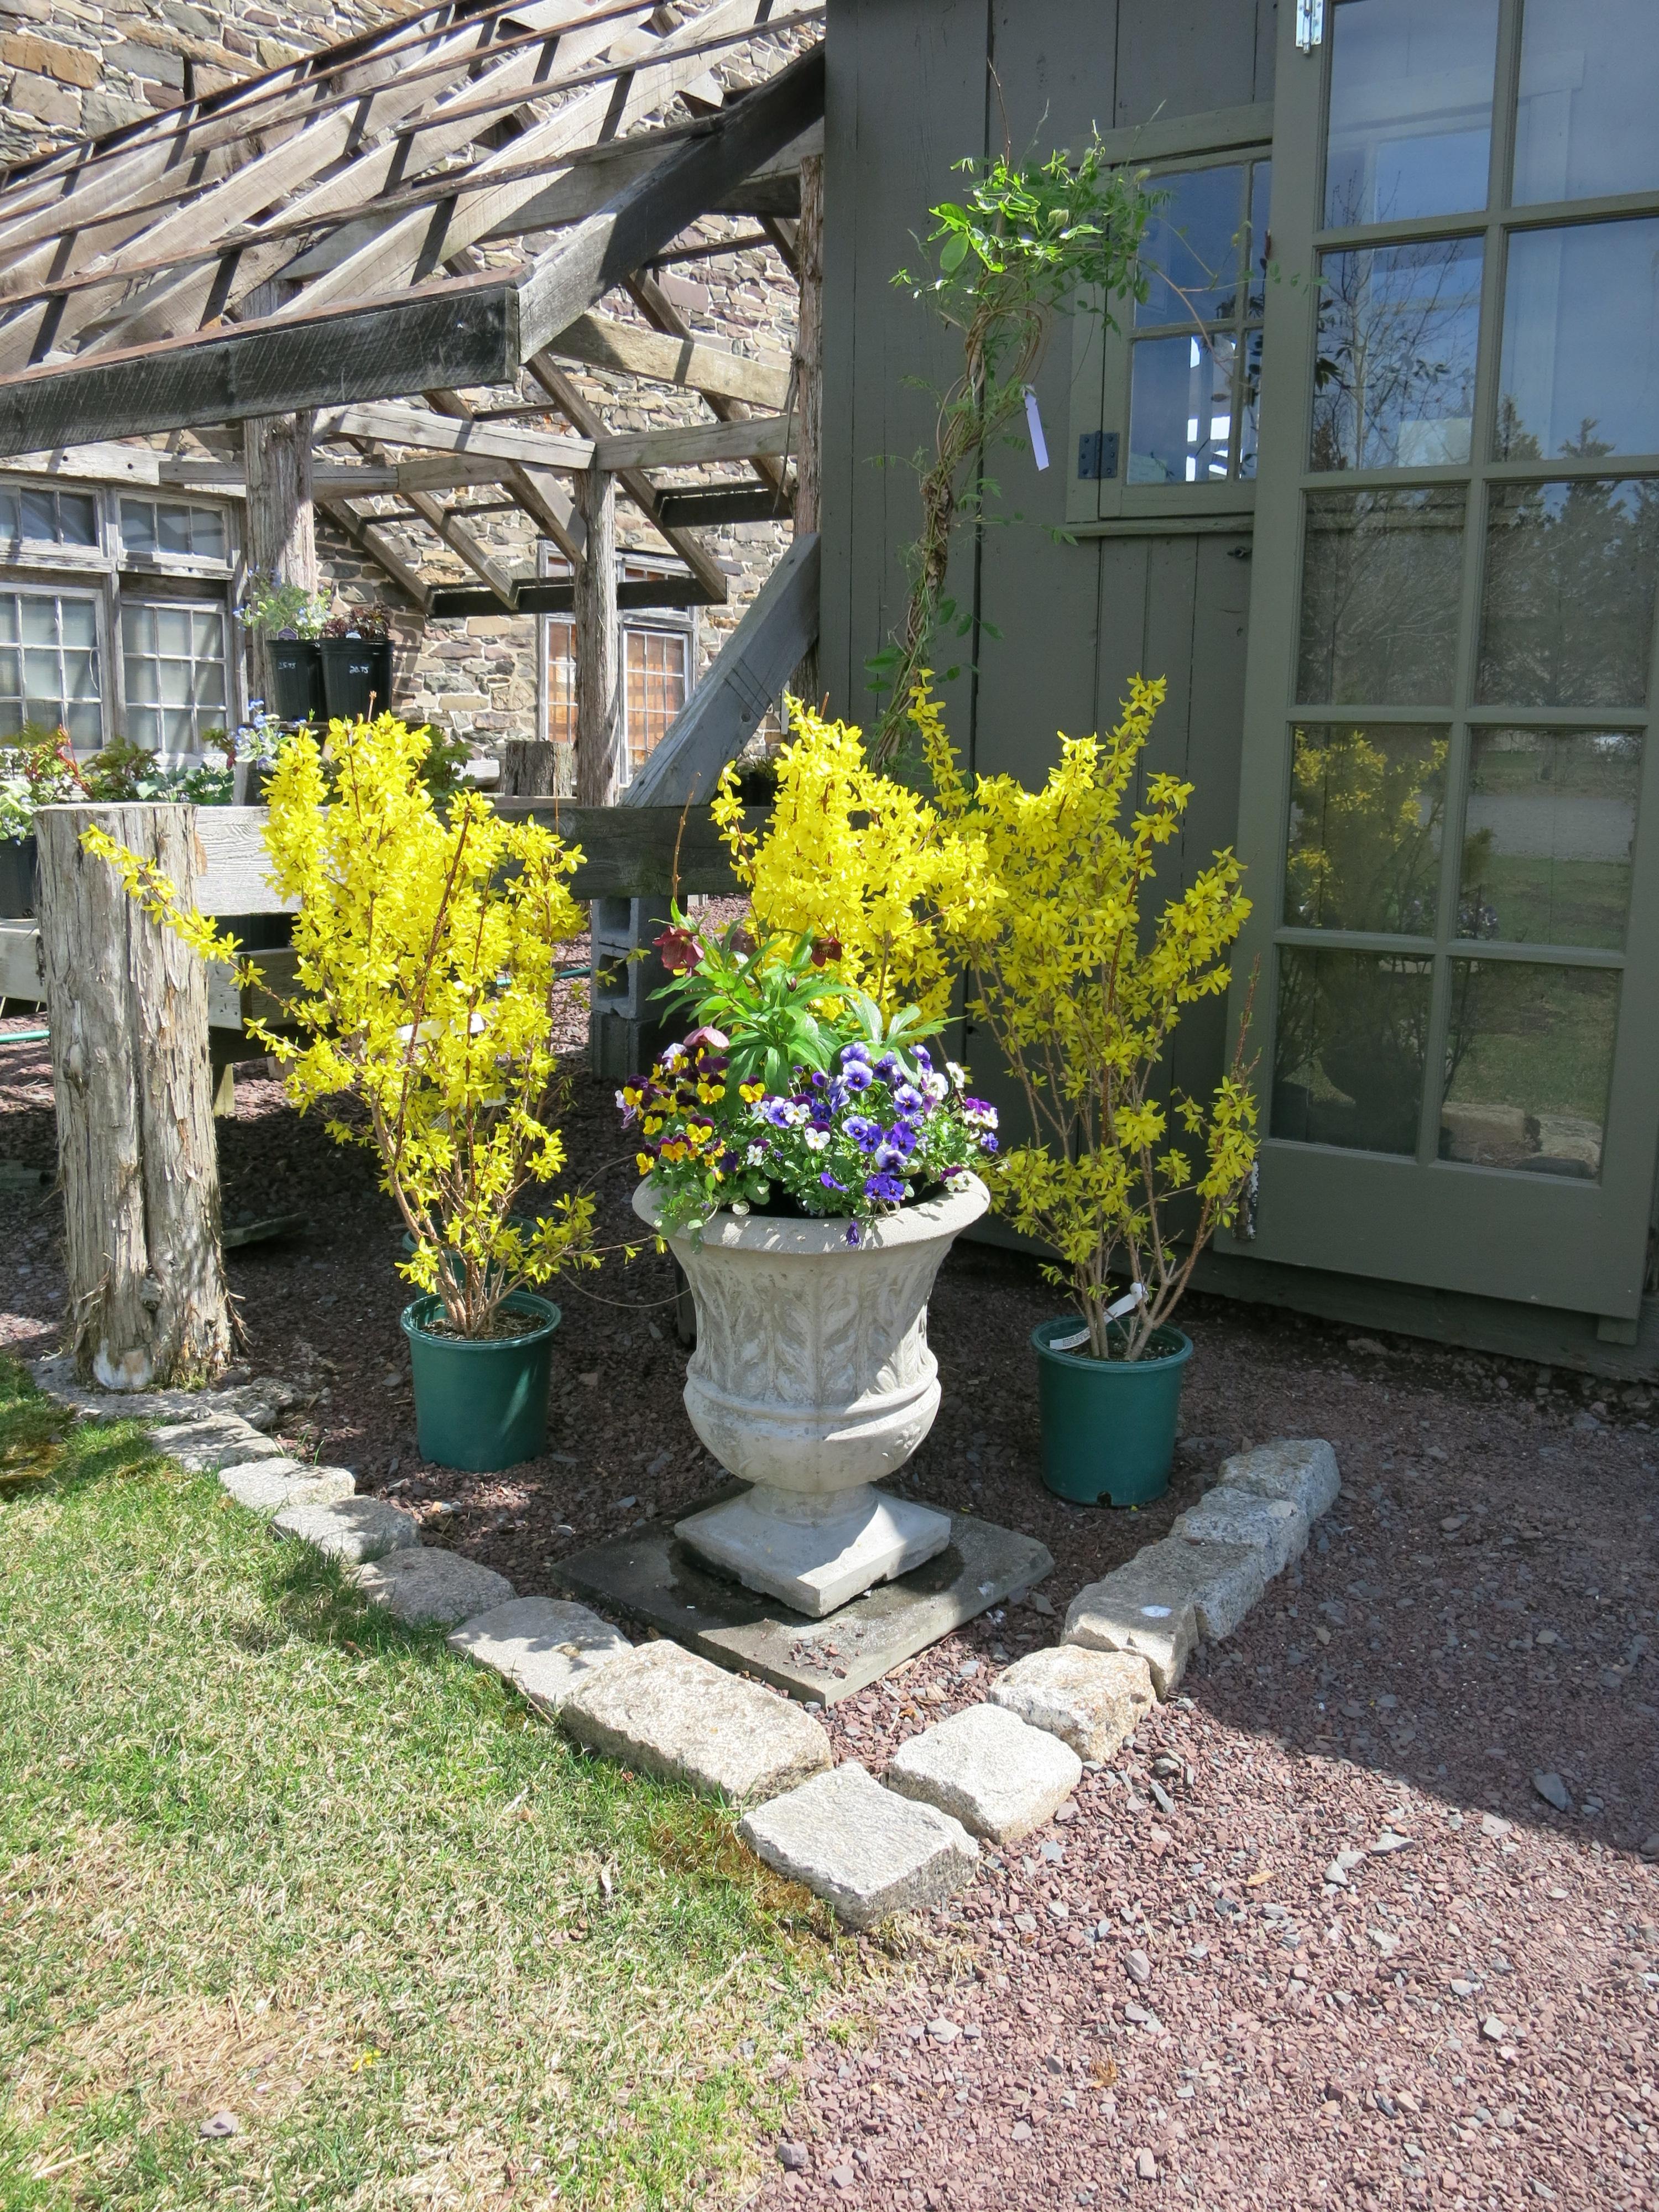 Jerry fritz garden design new arrivals for spring for Spring hill nursery garden designs